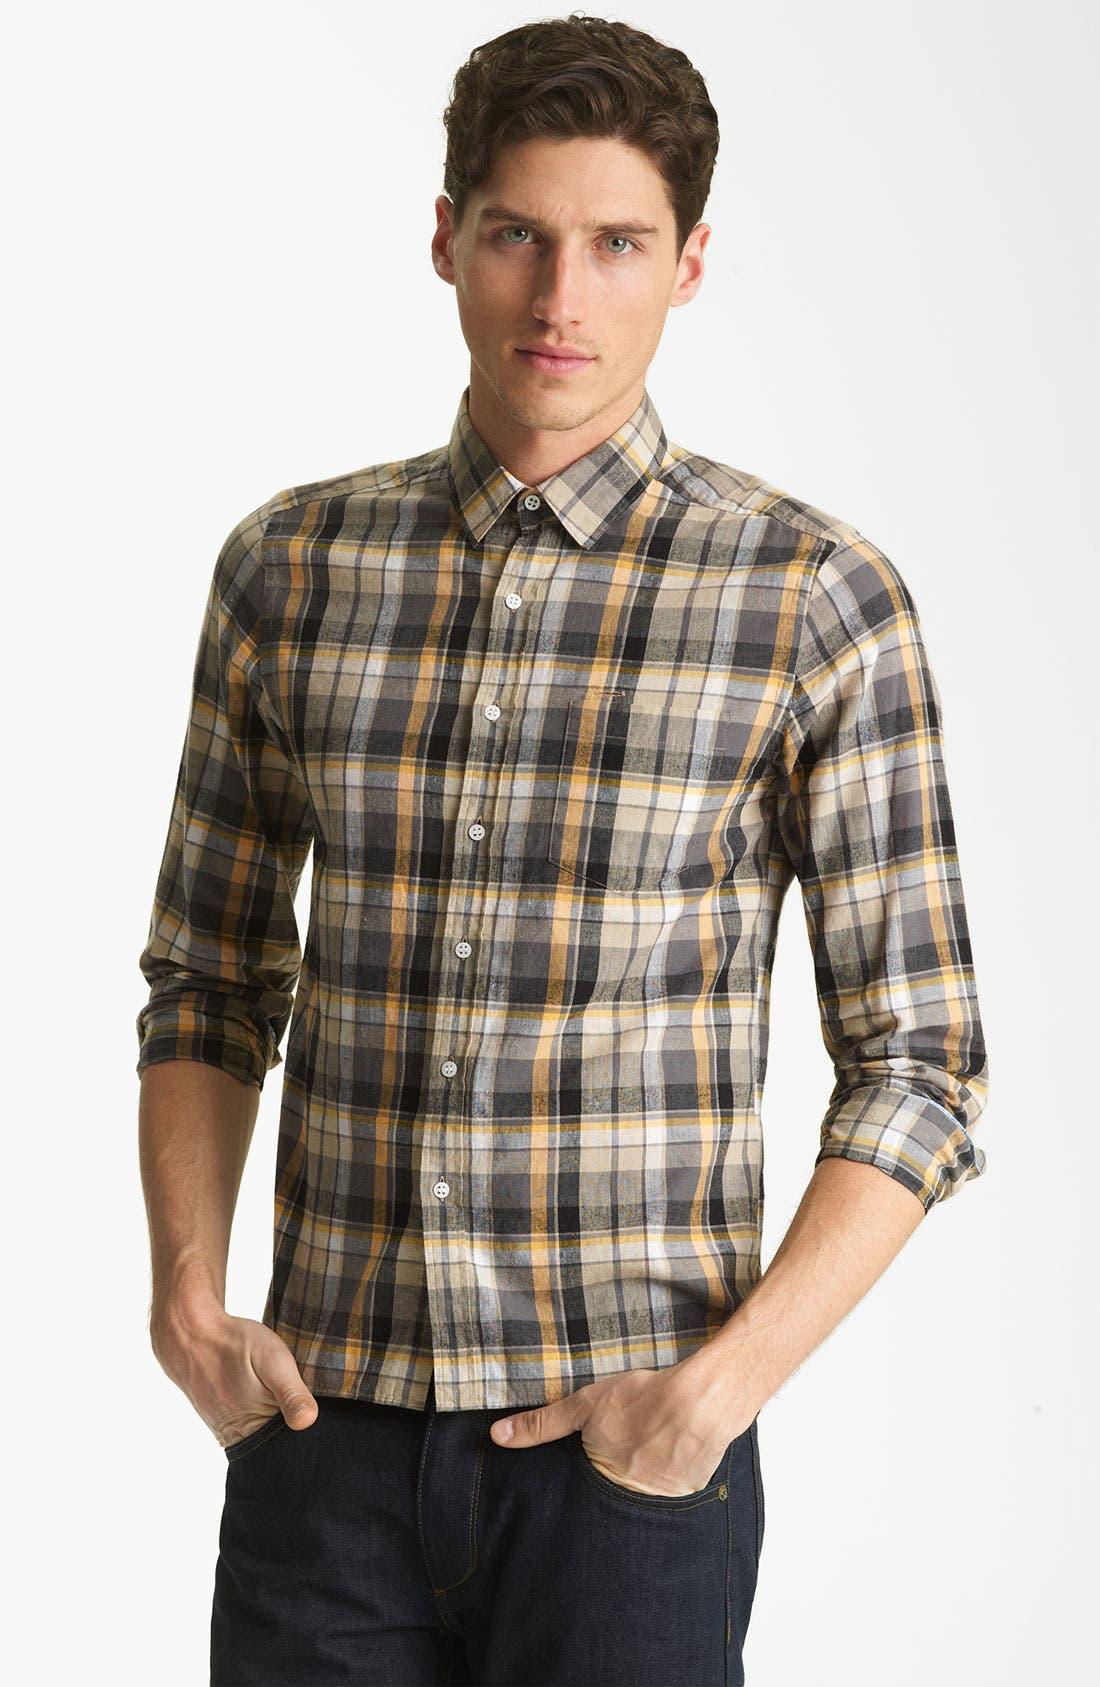 Alternate Image 1 Selected - Shipley & Halmos 'Marine' Washed Woven Shirt